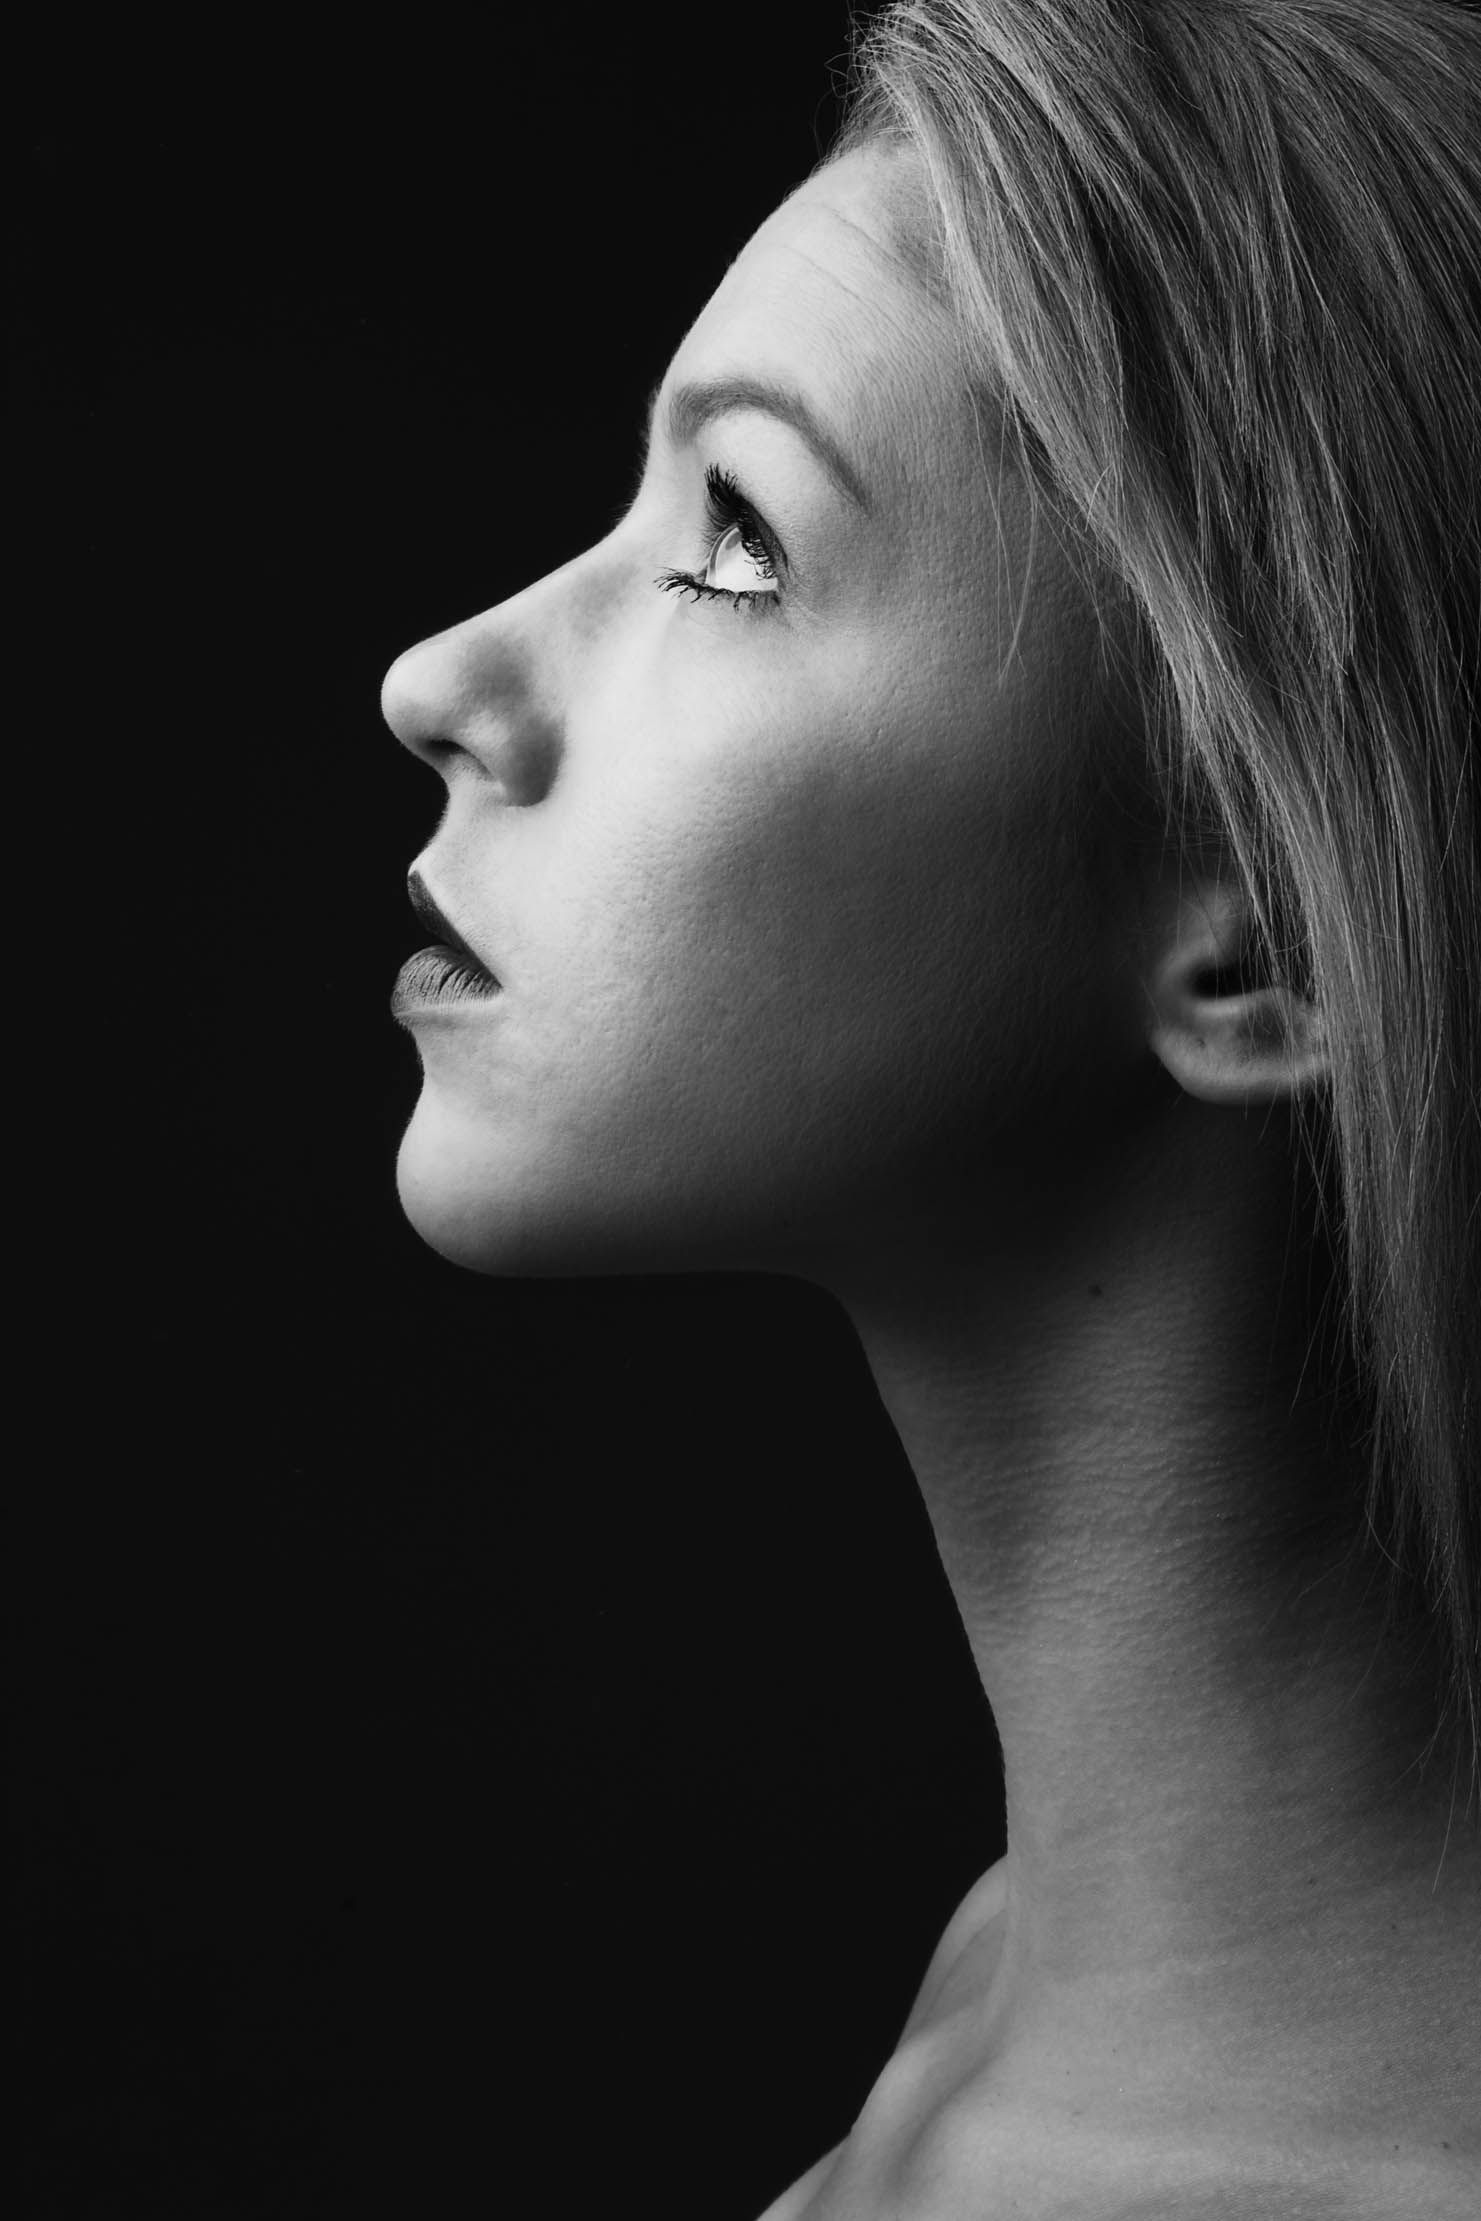 Black And White Portrait-side View Portrait In 2019 Side Profile